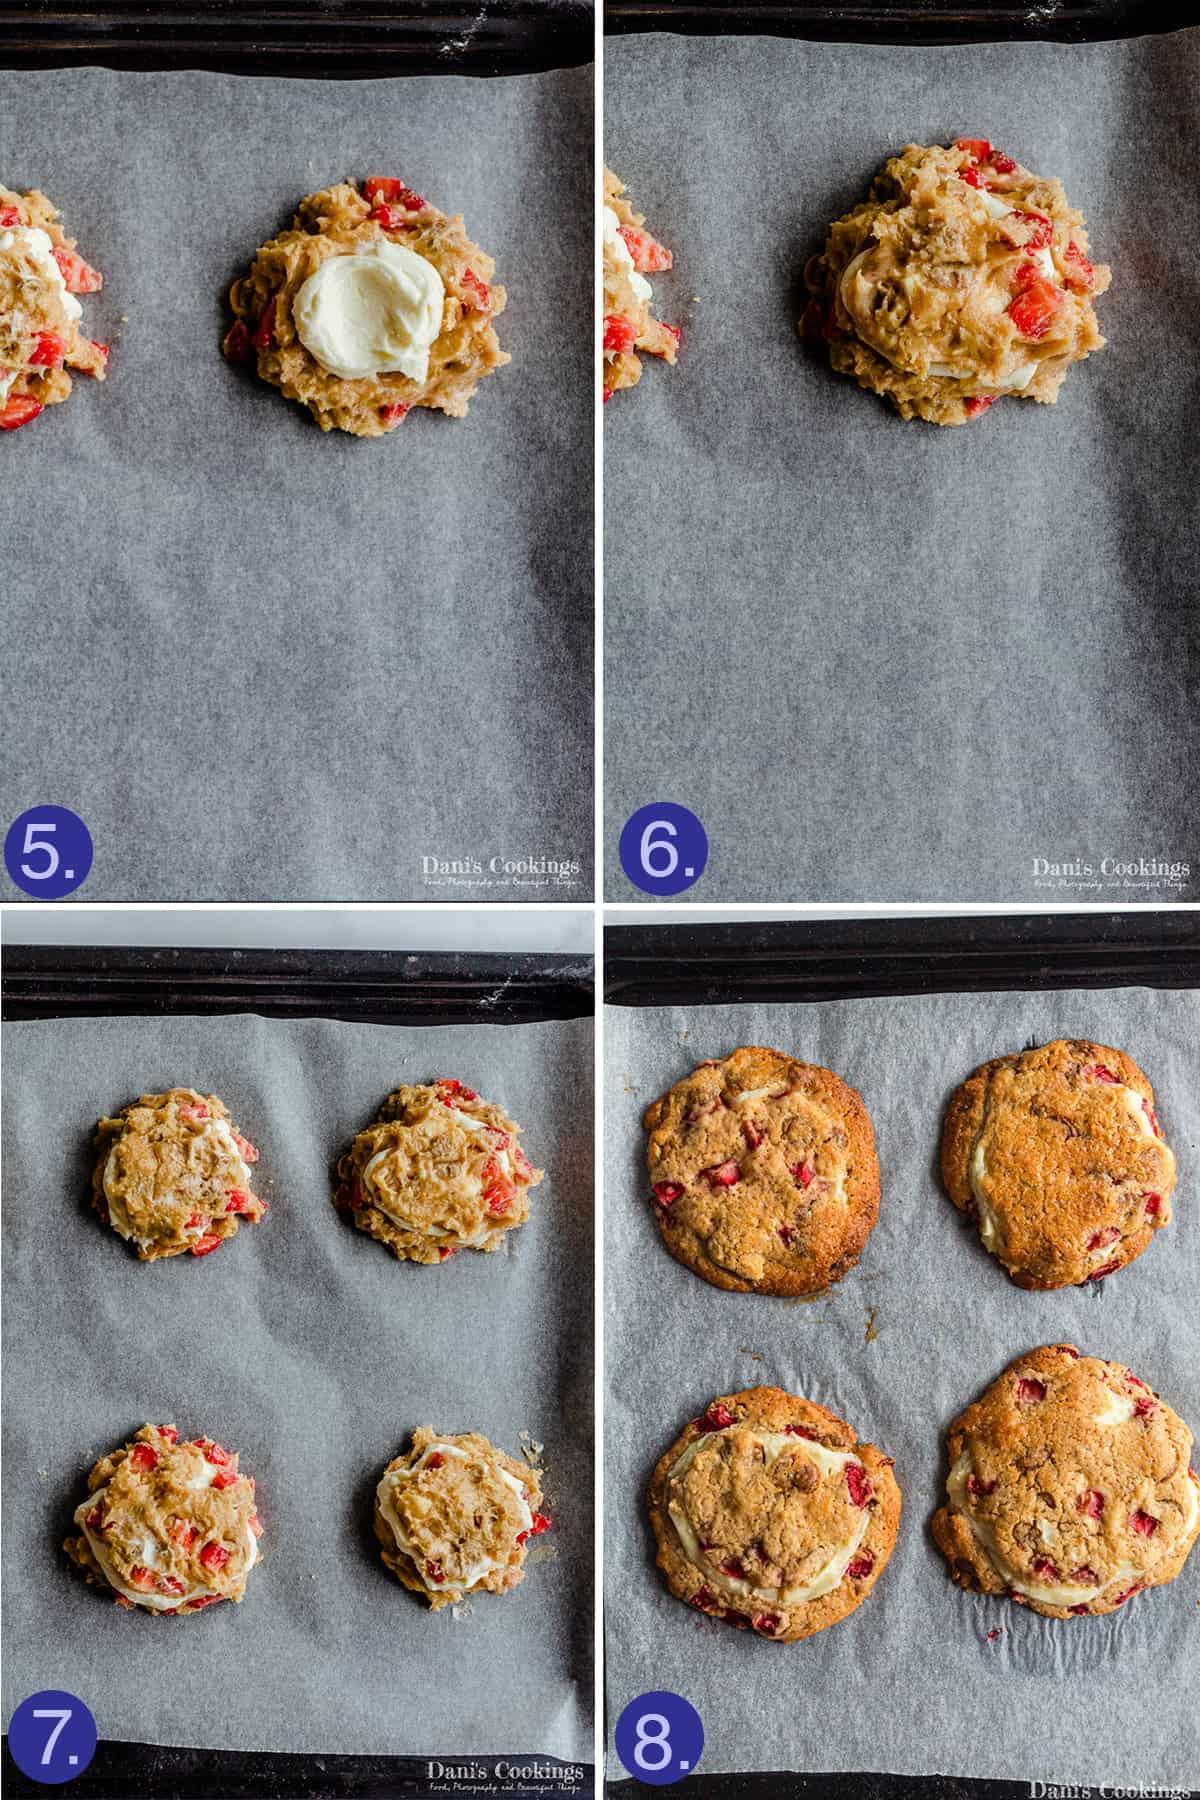 assembling and baking steps